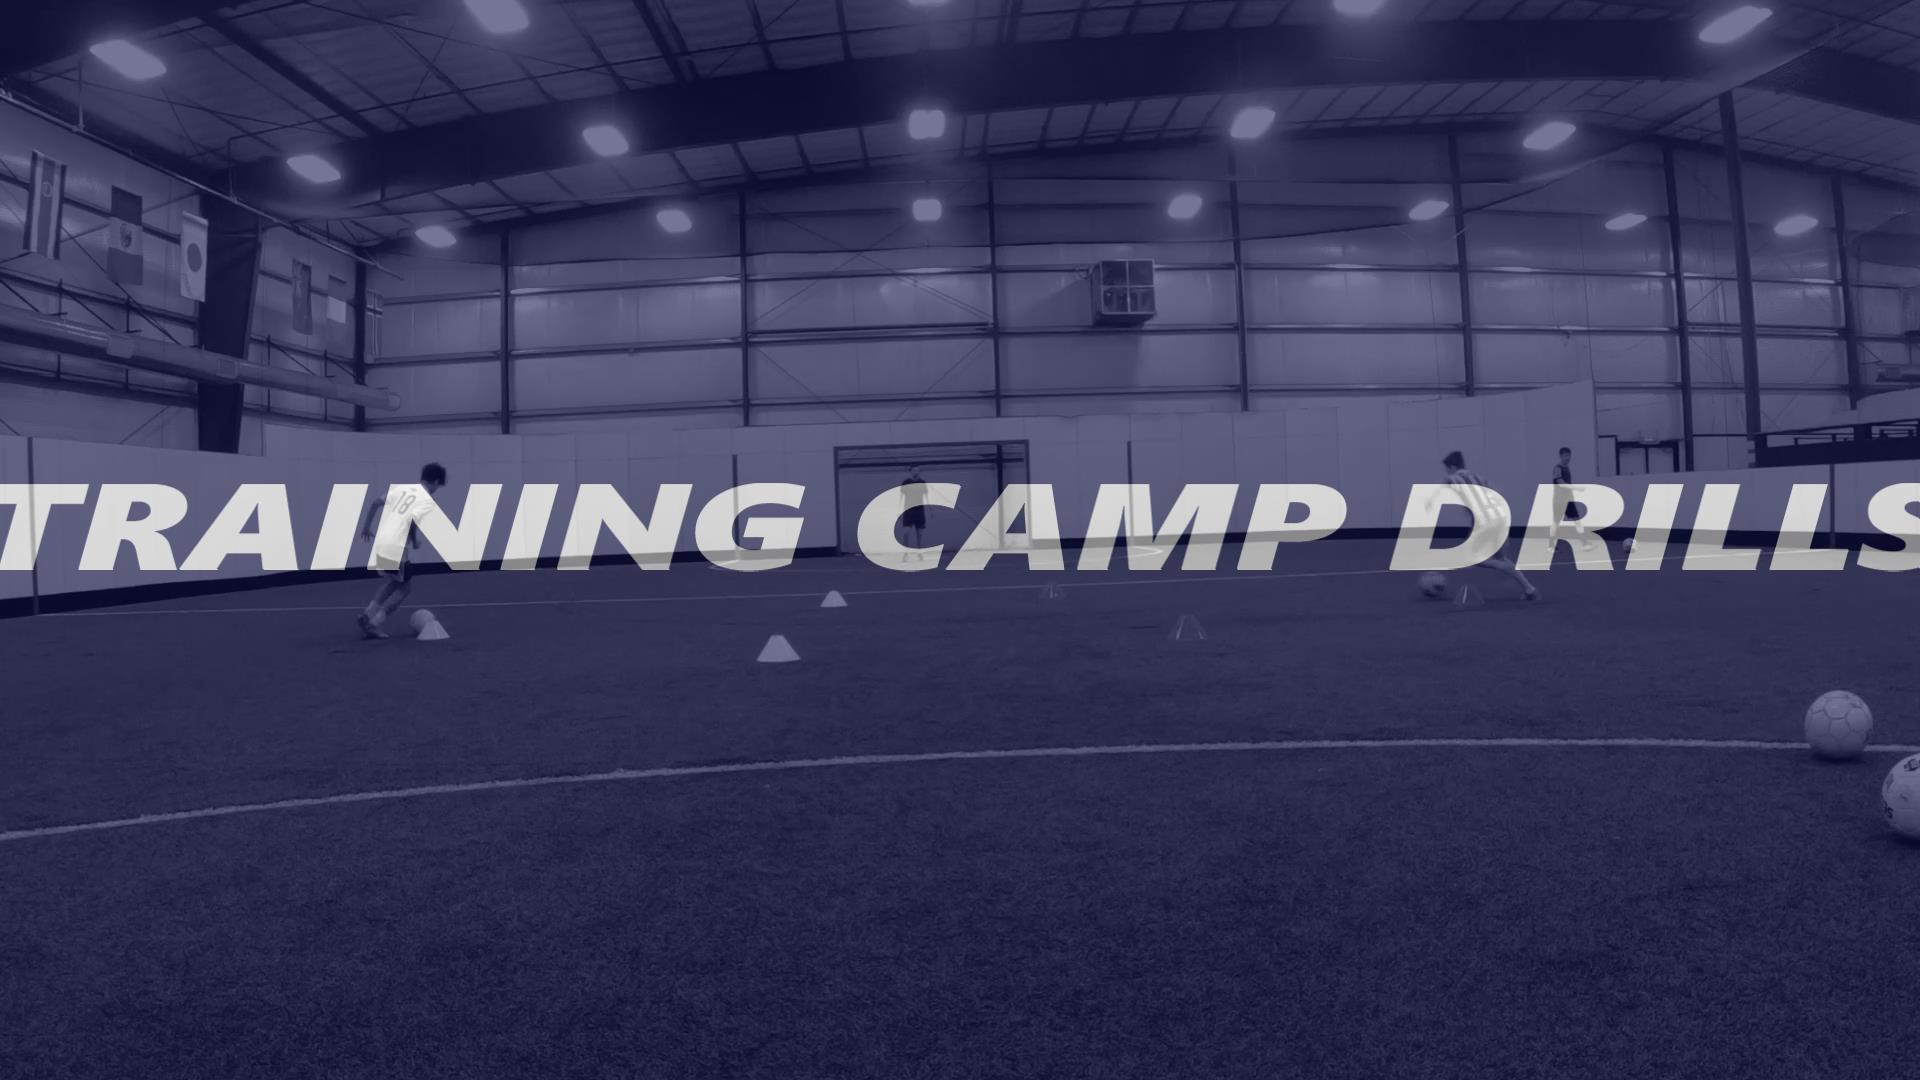 Soccer Training Camp Drills